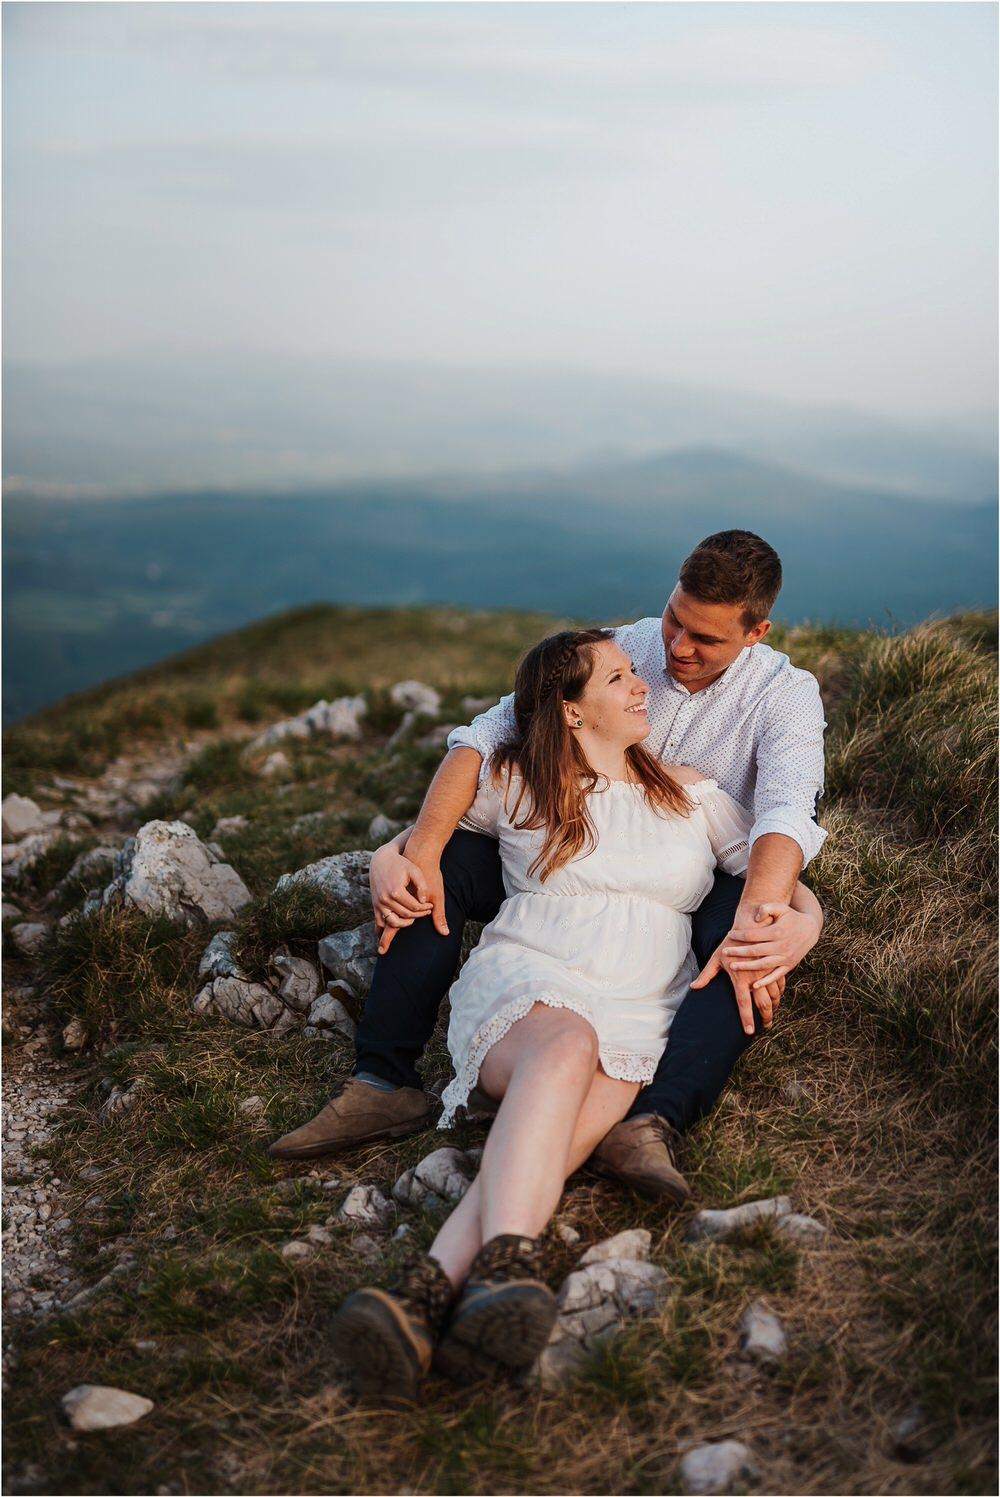 tuscany wedding photographer greece croatia dubrovnik vjencanje hochzeit wedding photography photos romantic engagement nika grega 0054.jpg